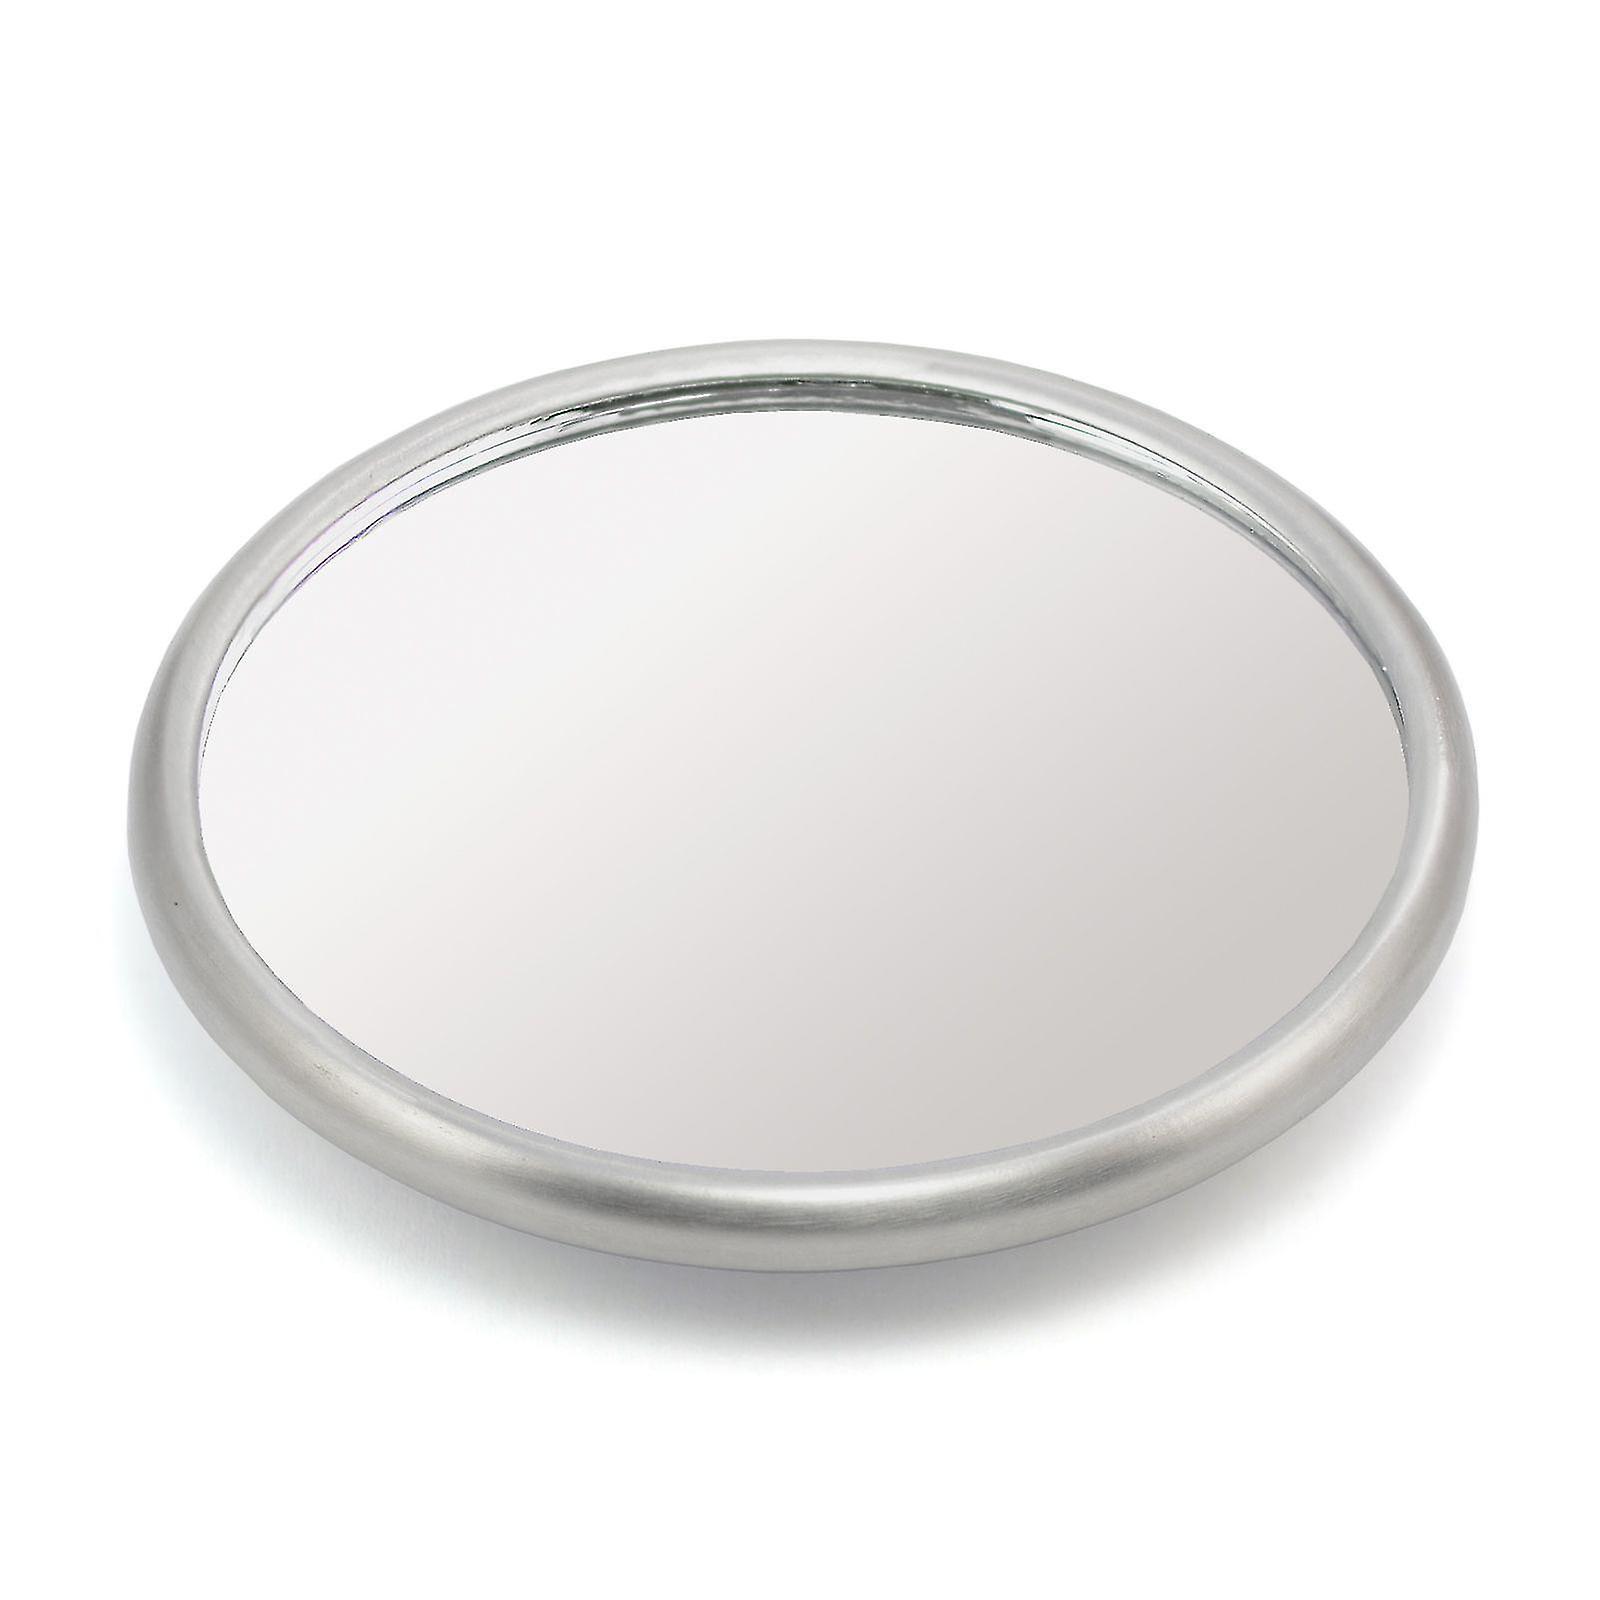 Compact mirror pACS-9